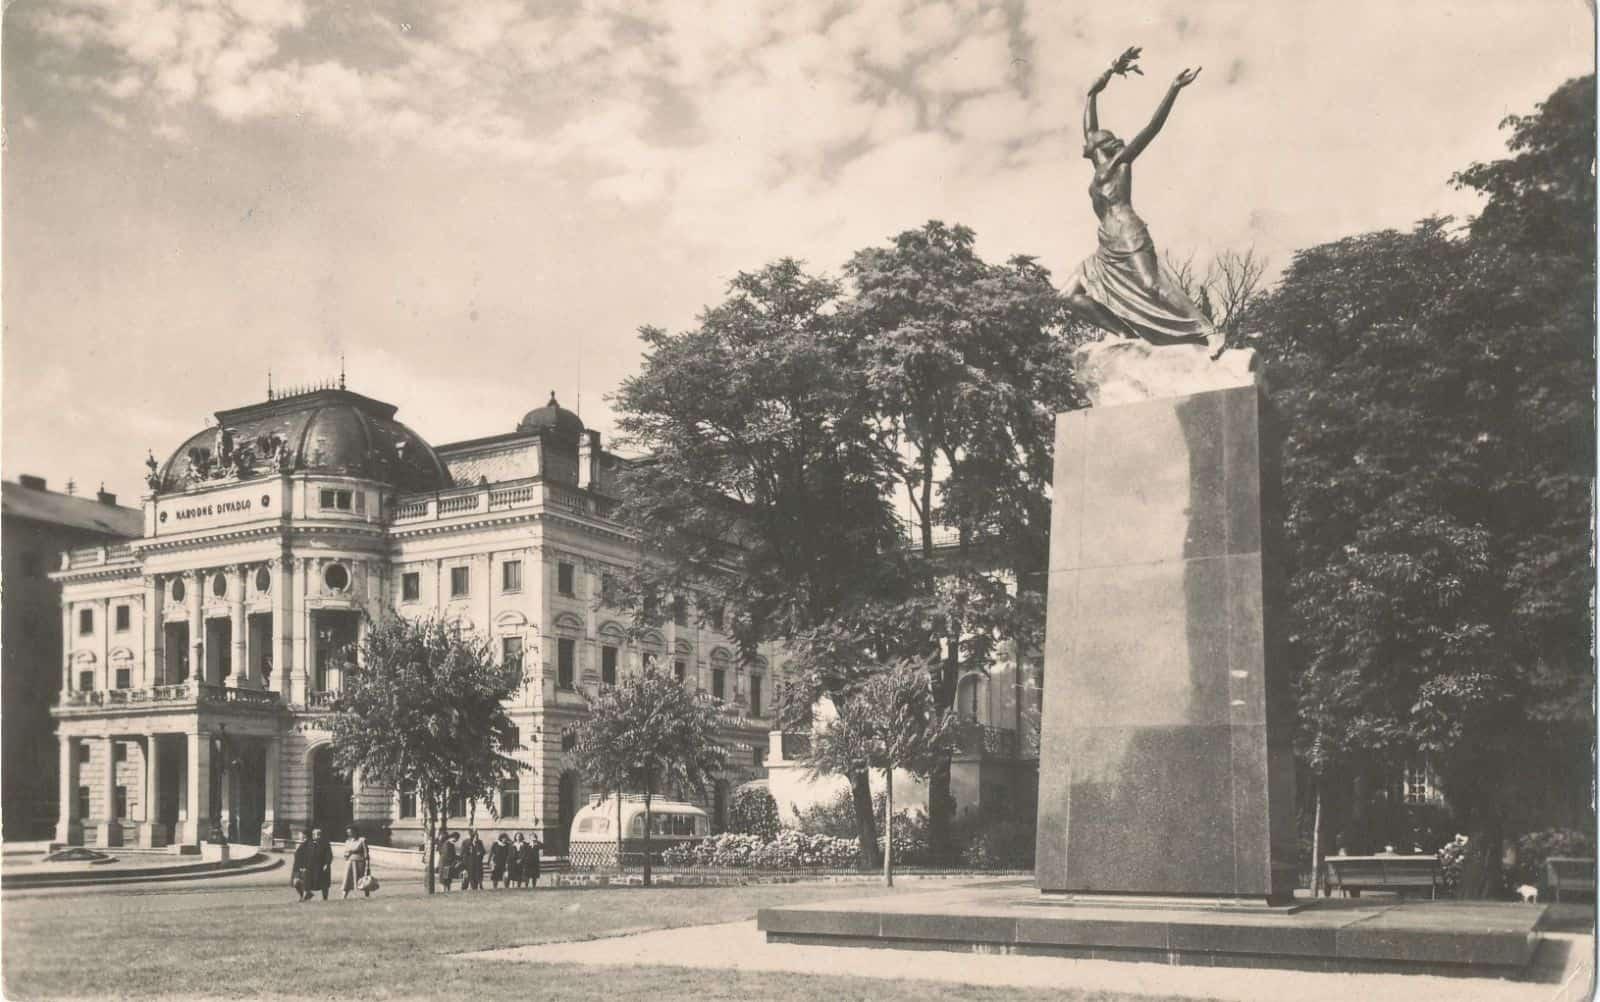 Autor: 1954, Bratislava historické fotografie / Kronika Slovenskej republiky